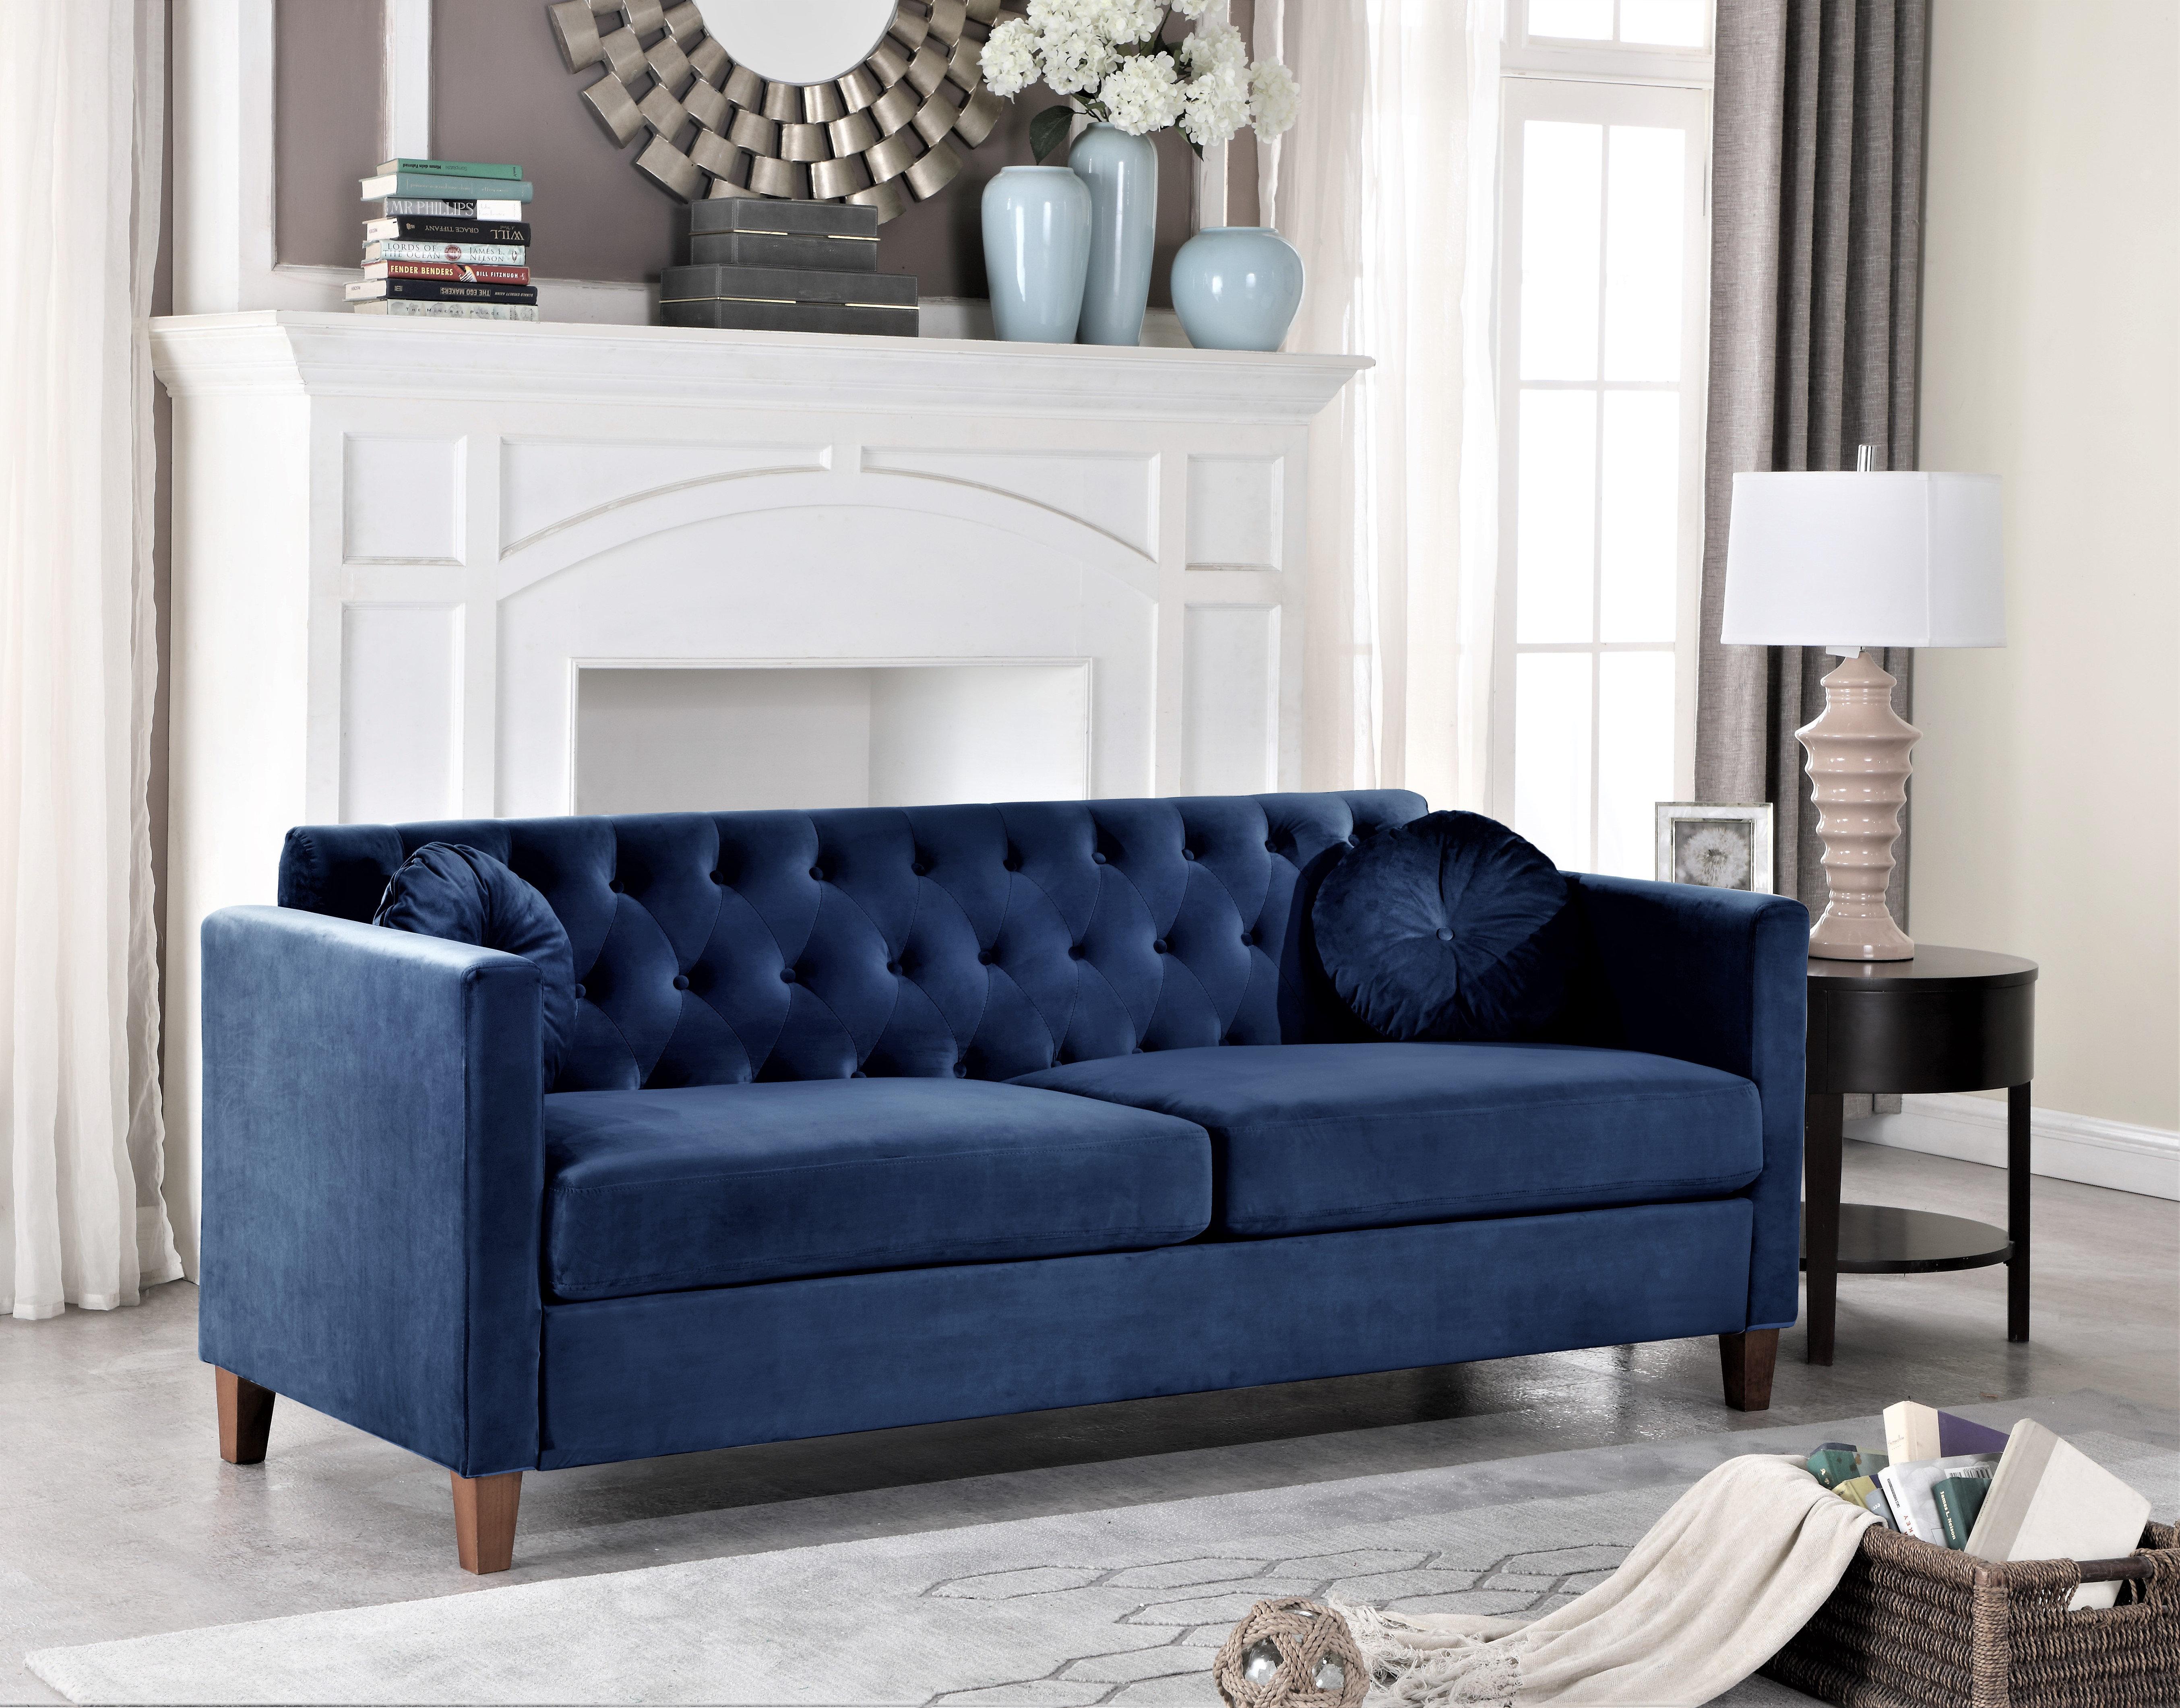 Blue Velvet Sofas Couches You Ll Love In 2021 Wayfair